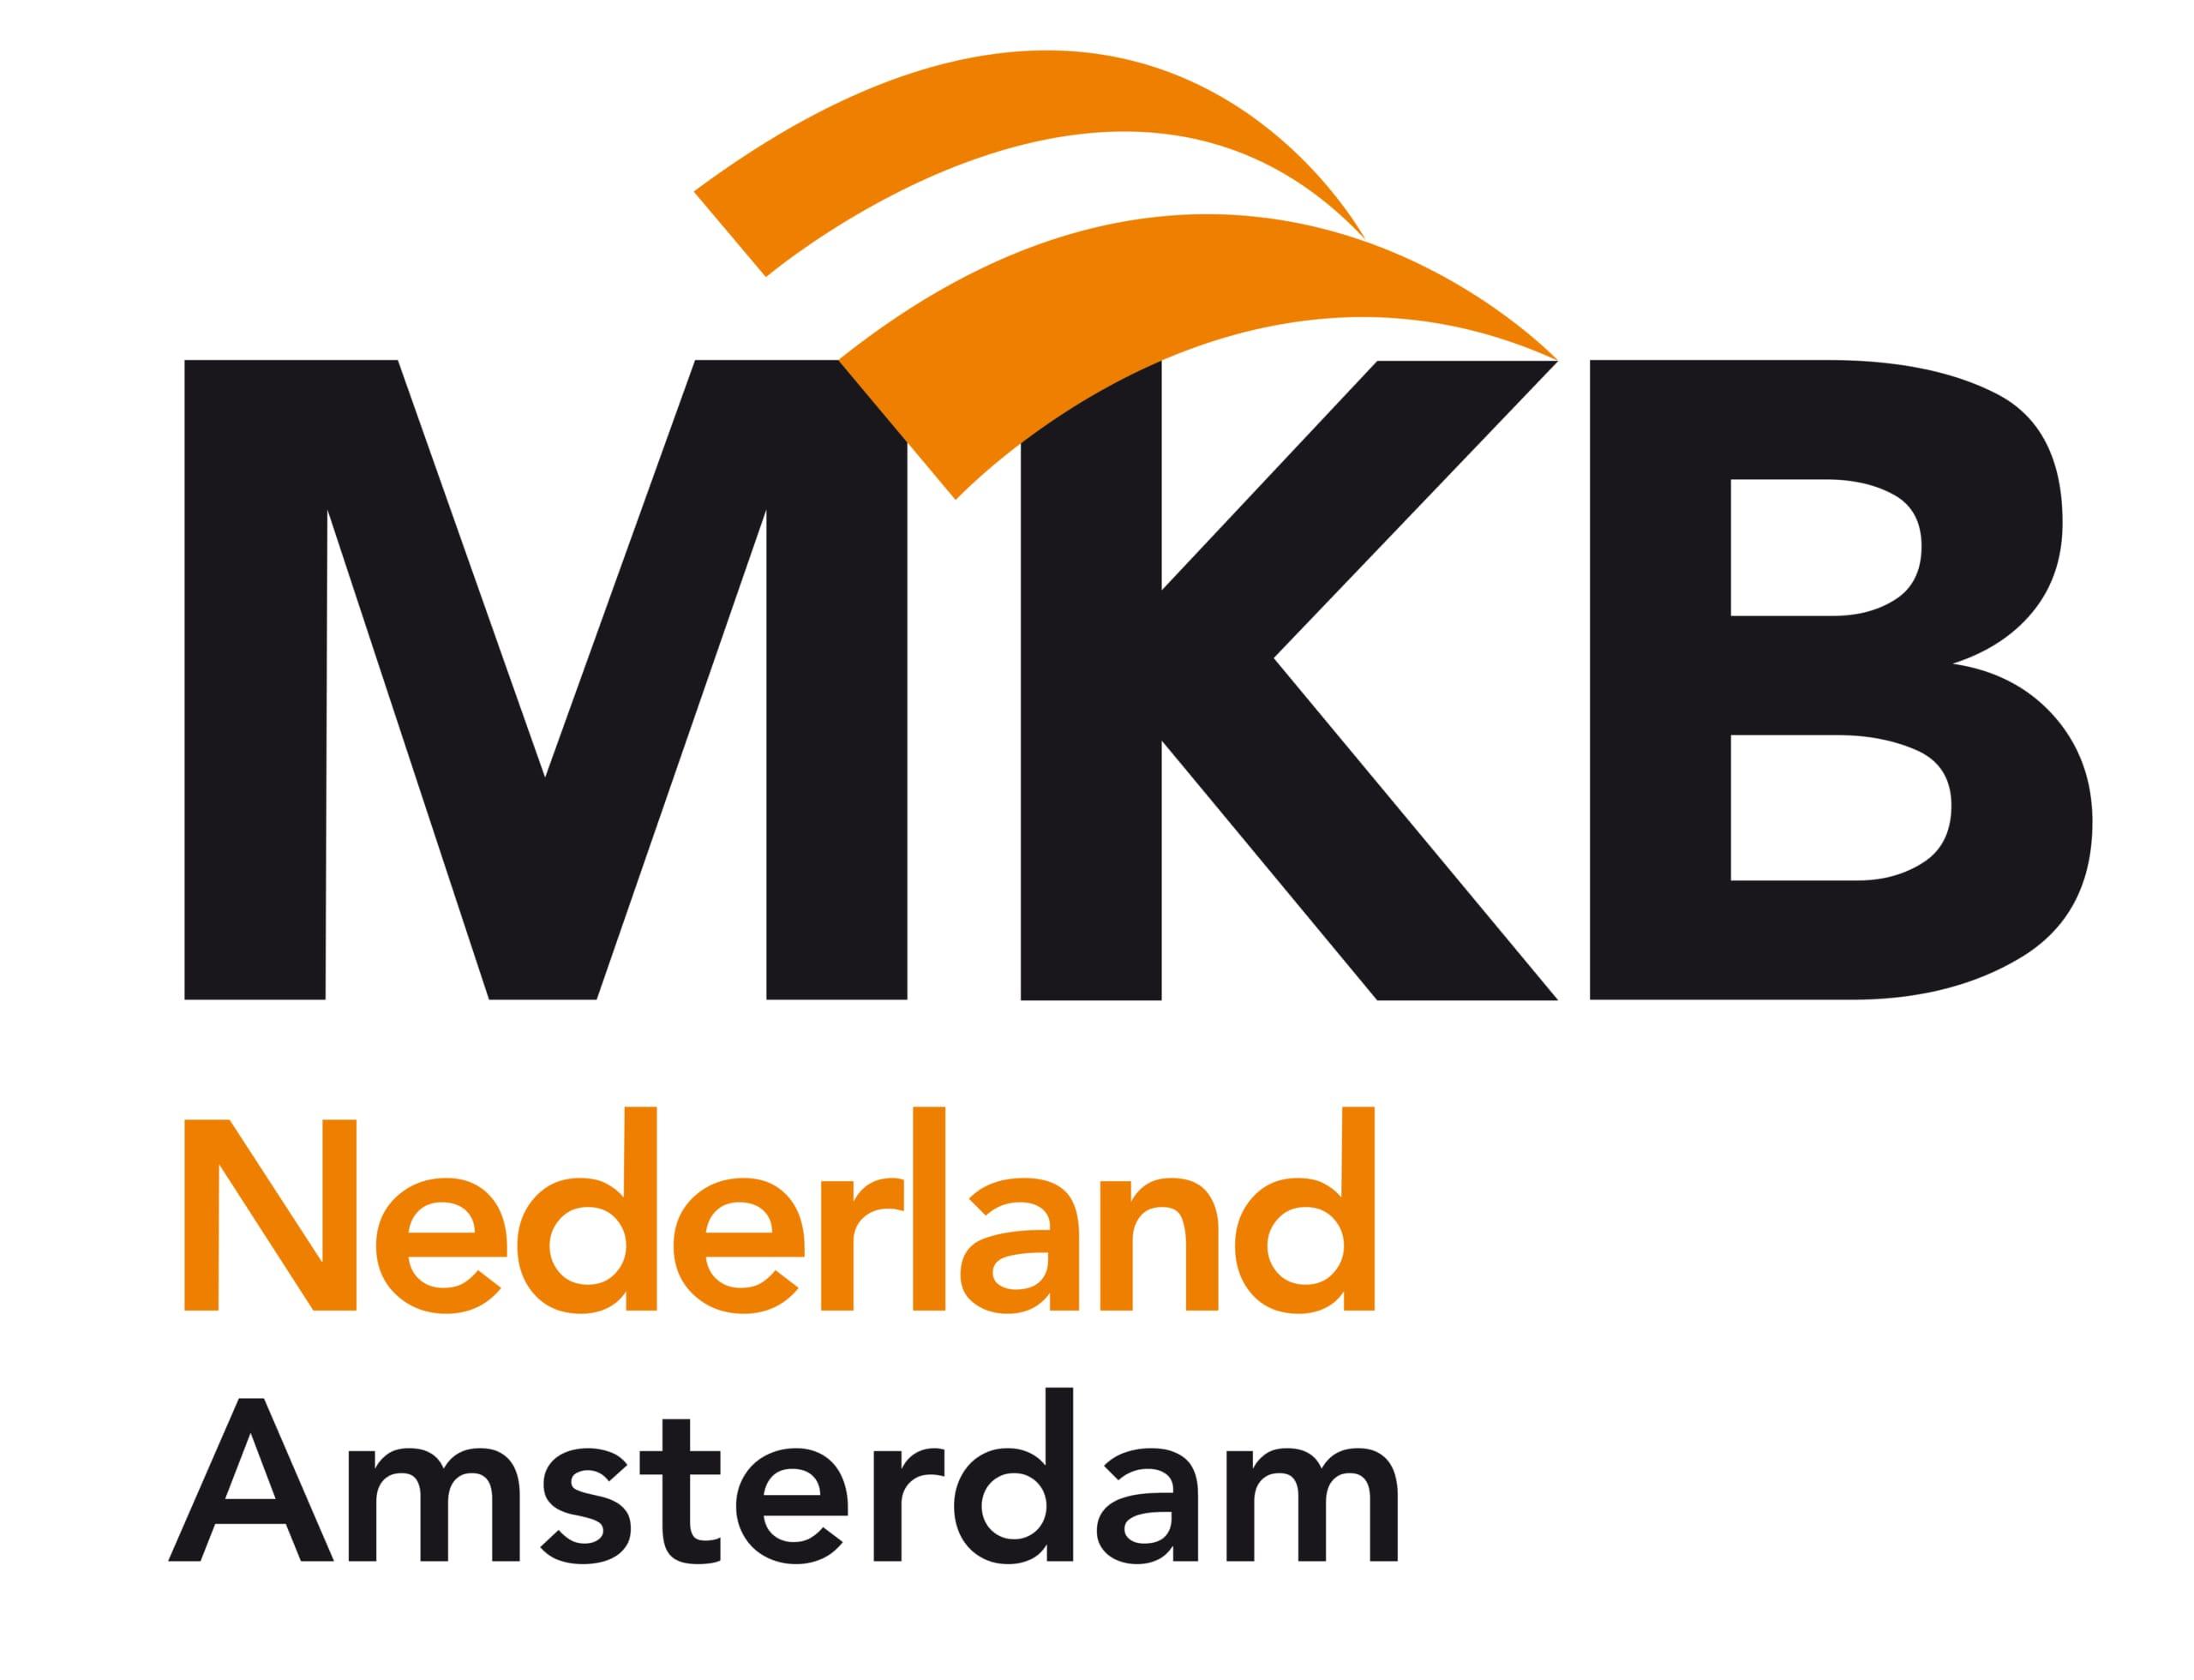 Stichting MKB Amsterdam